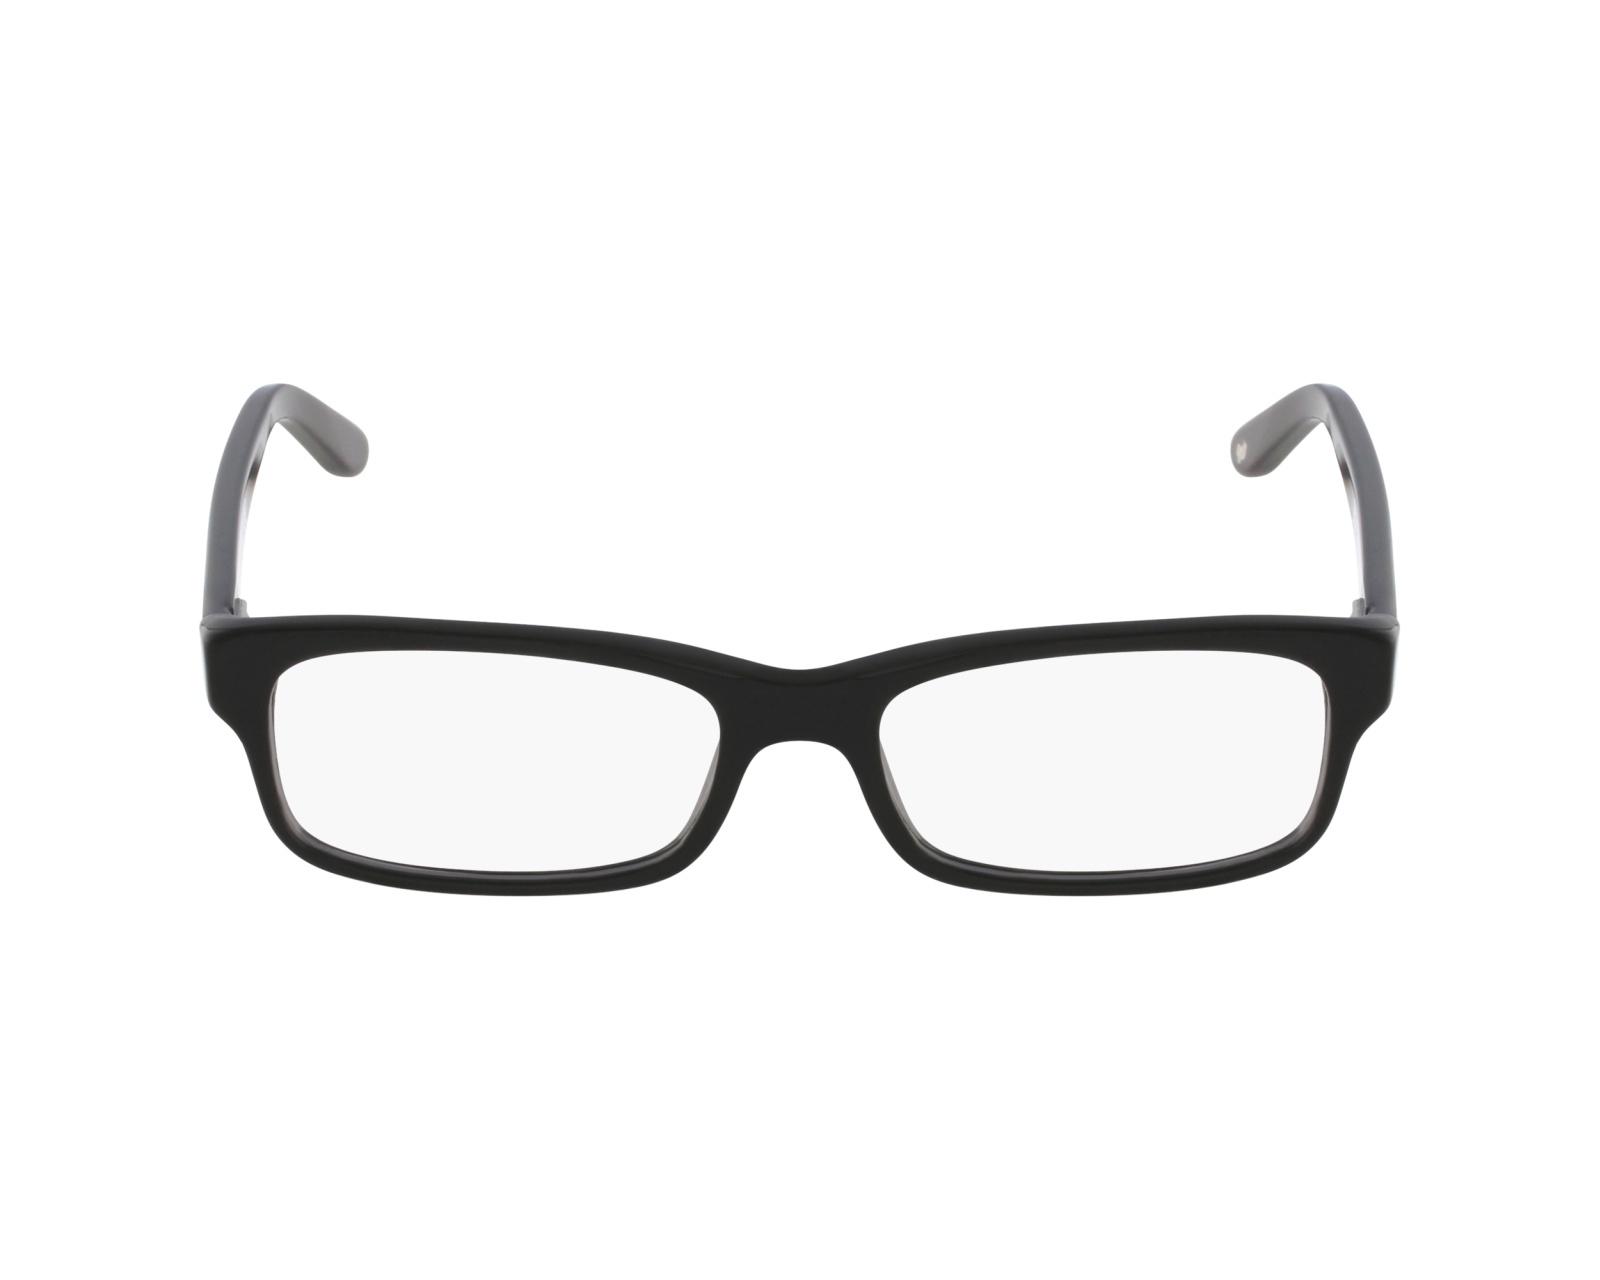 5f98285c2c ... spain ray ban eyeglasses rx5187 black 2000 rx5187 a6318 8dad3